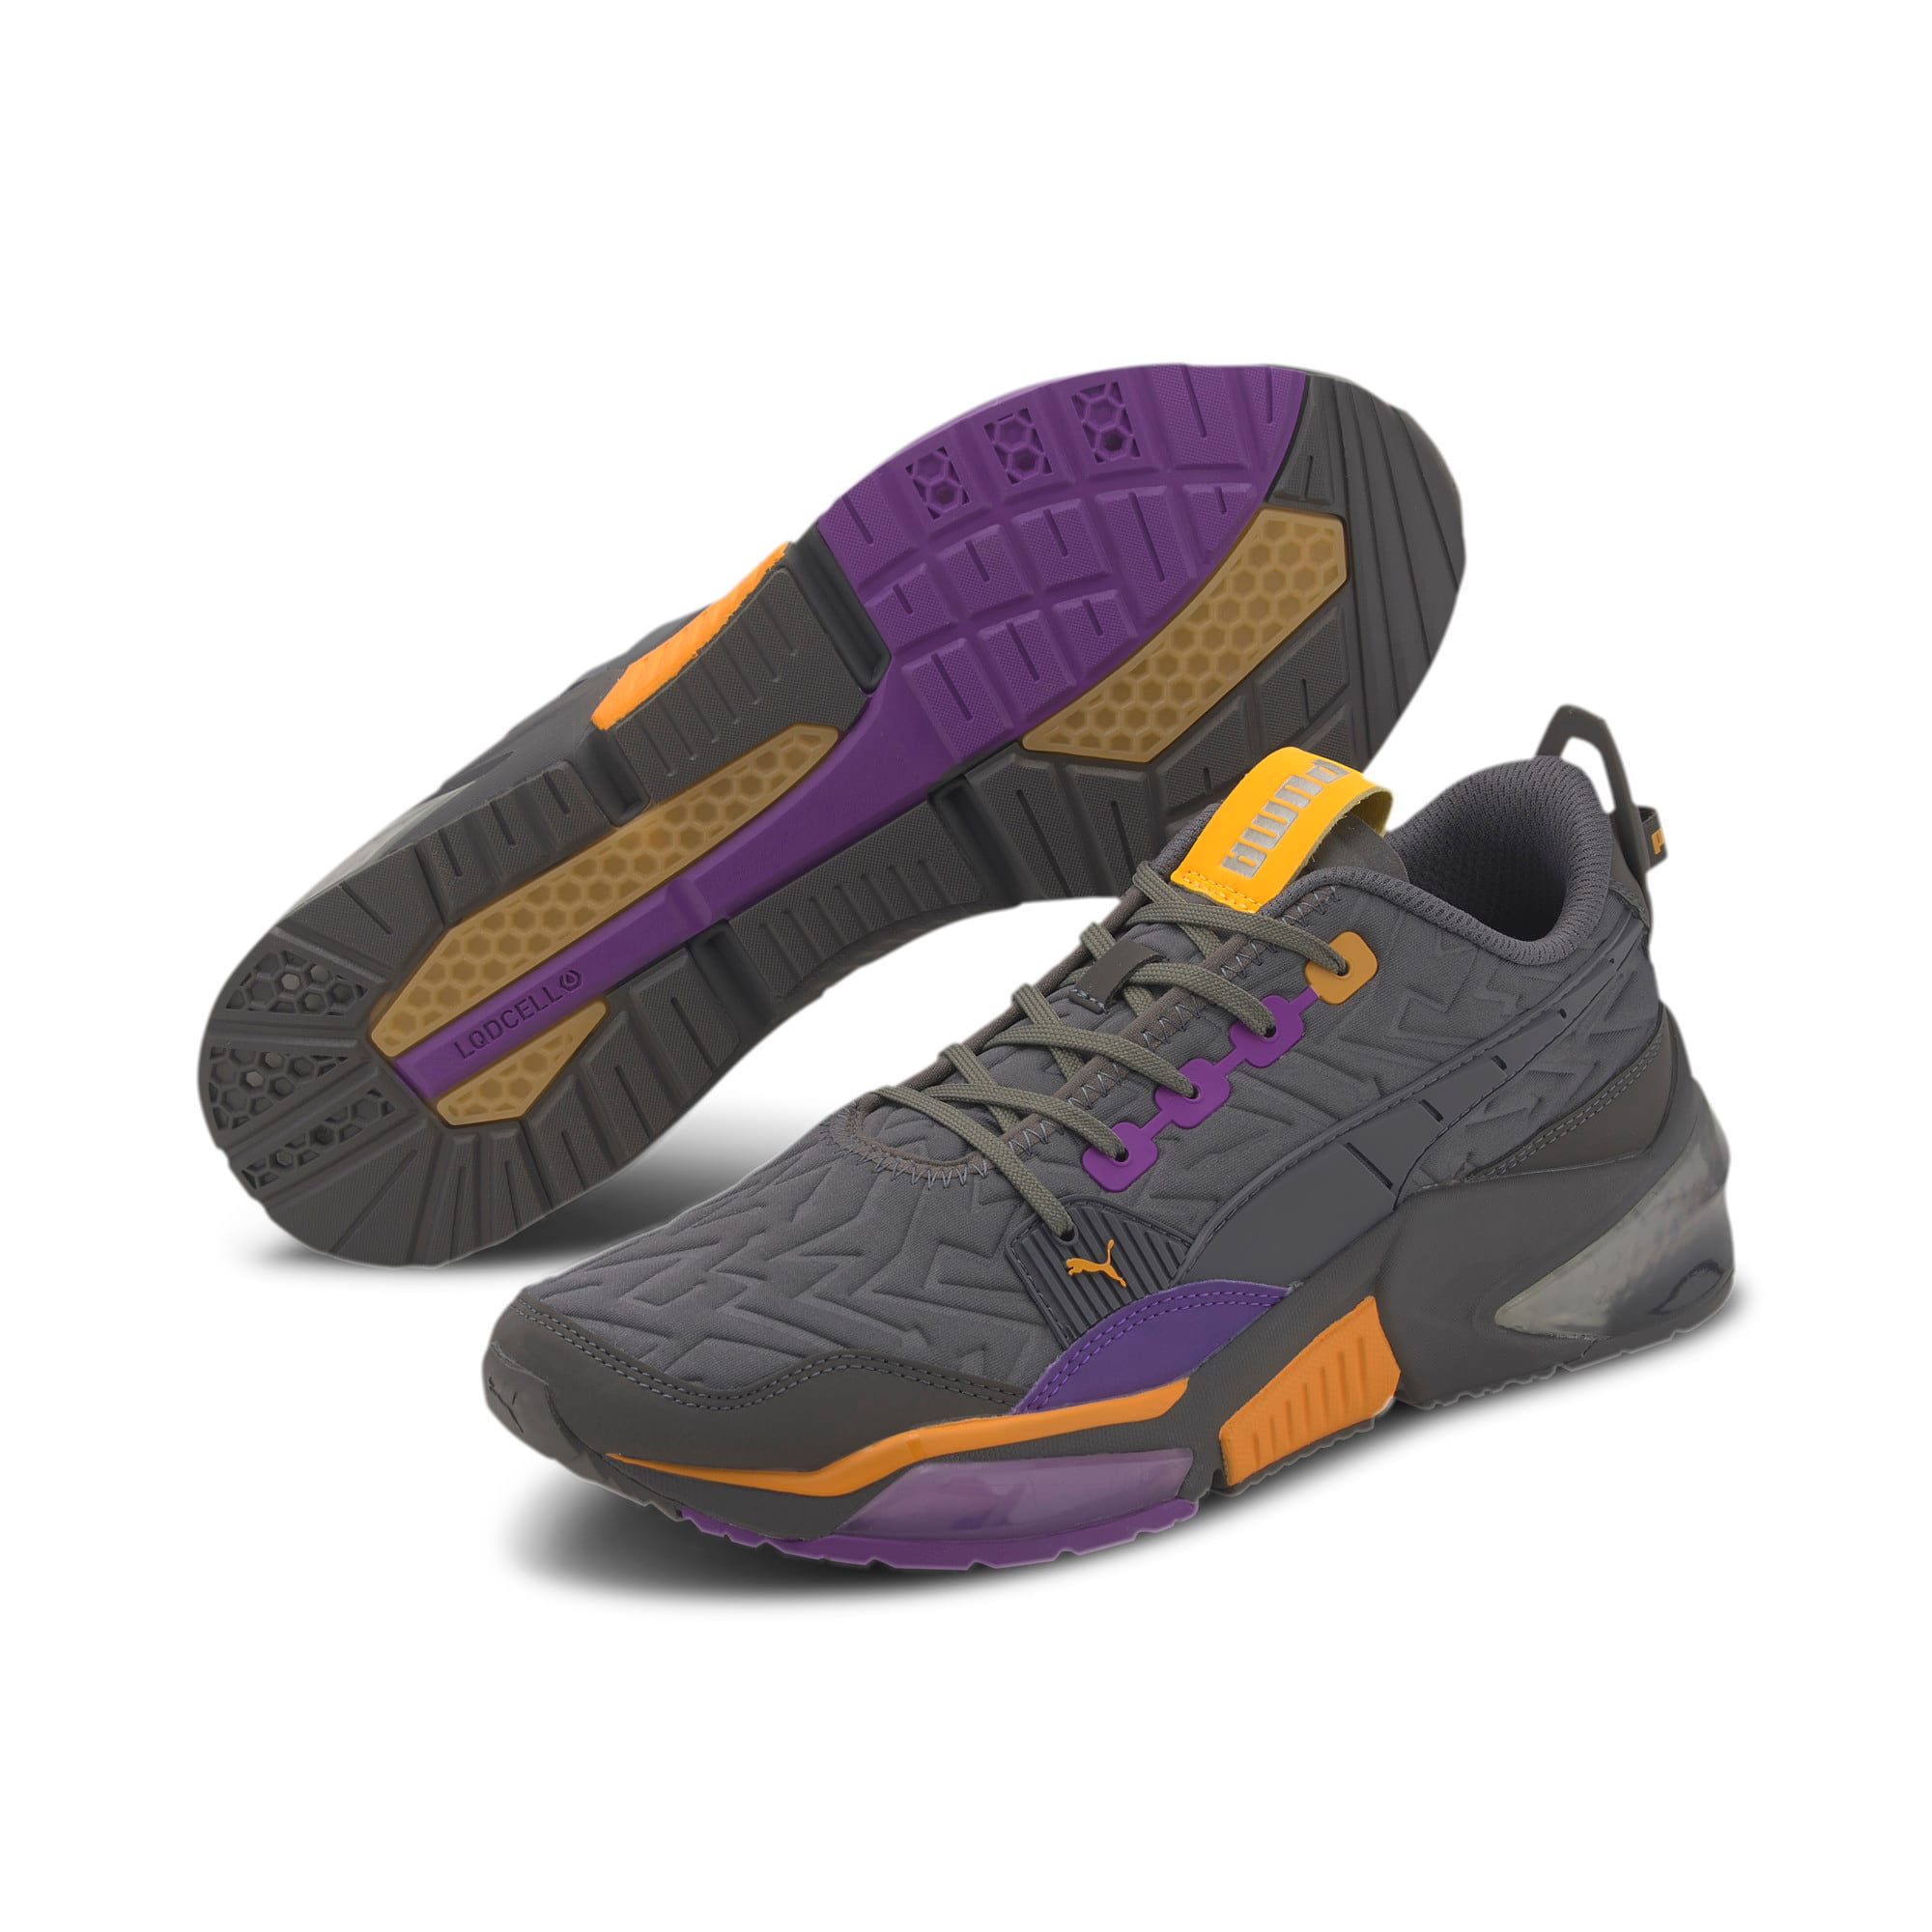 Thumbnail 2 of LQDCELL Optic Rave Men's Running Shoes, CASTLEROCK-Purple Glimmer, medium